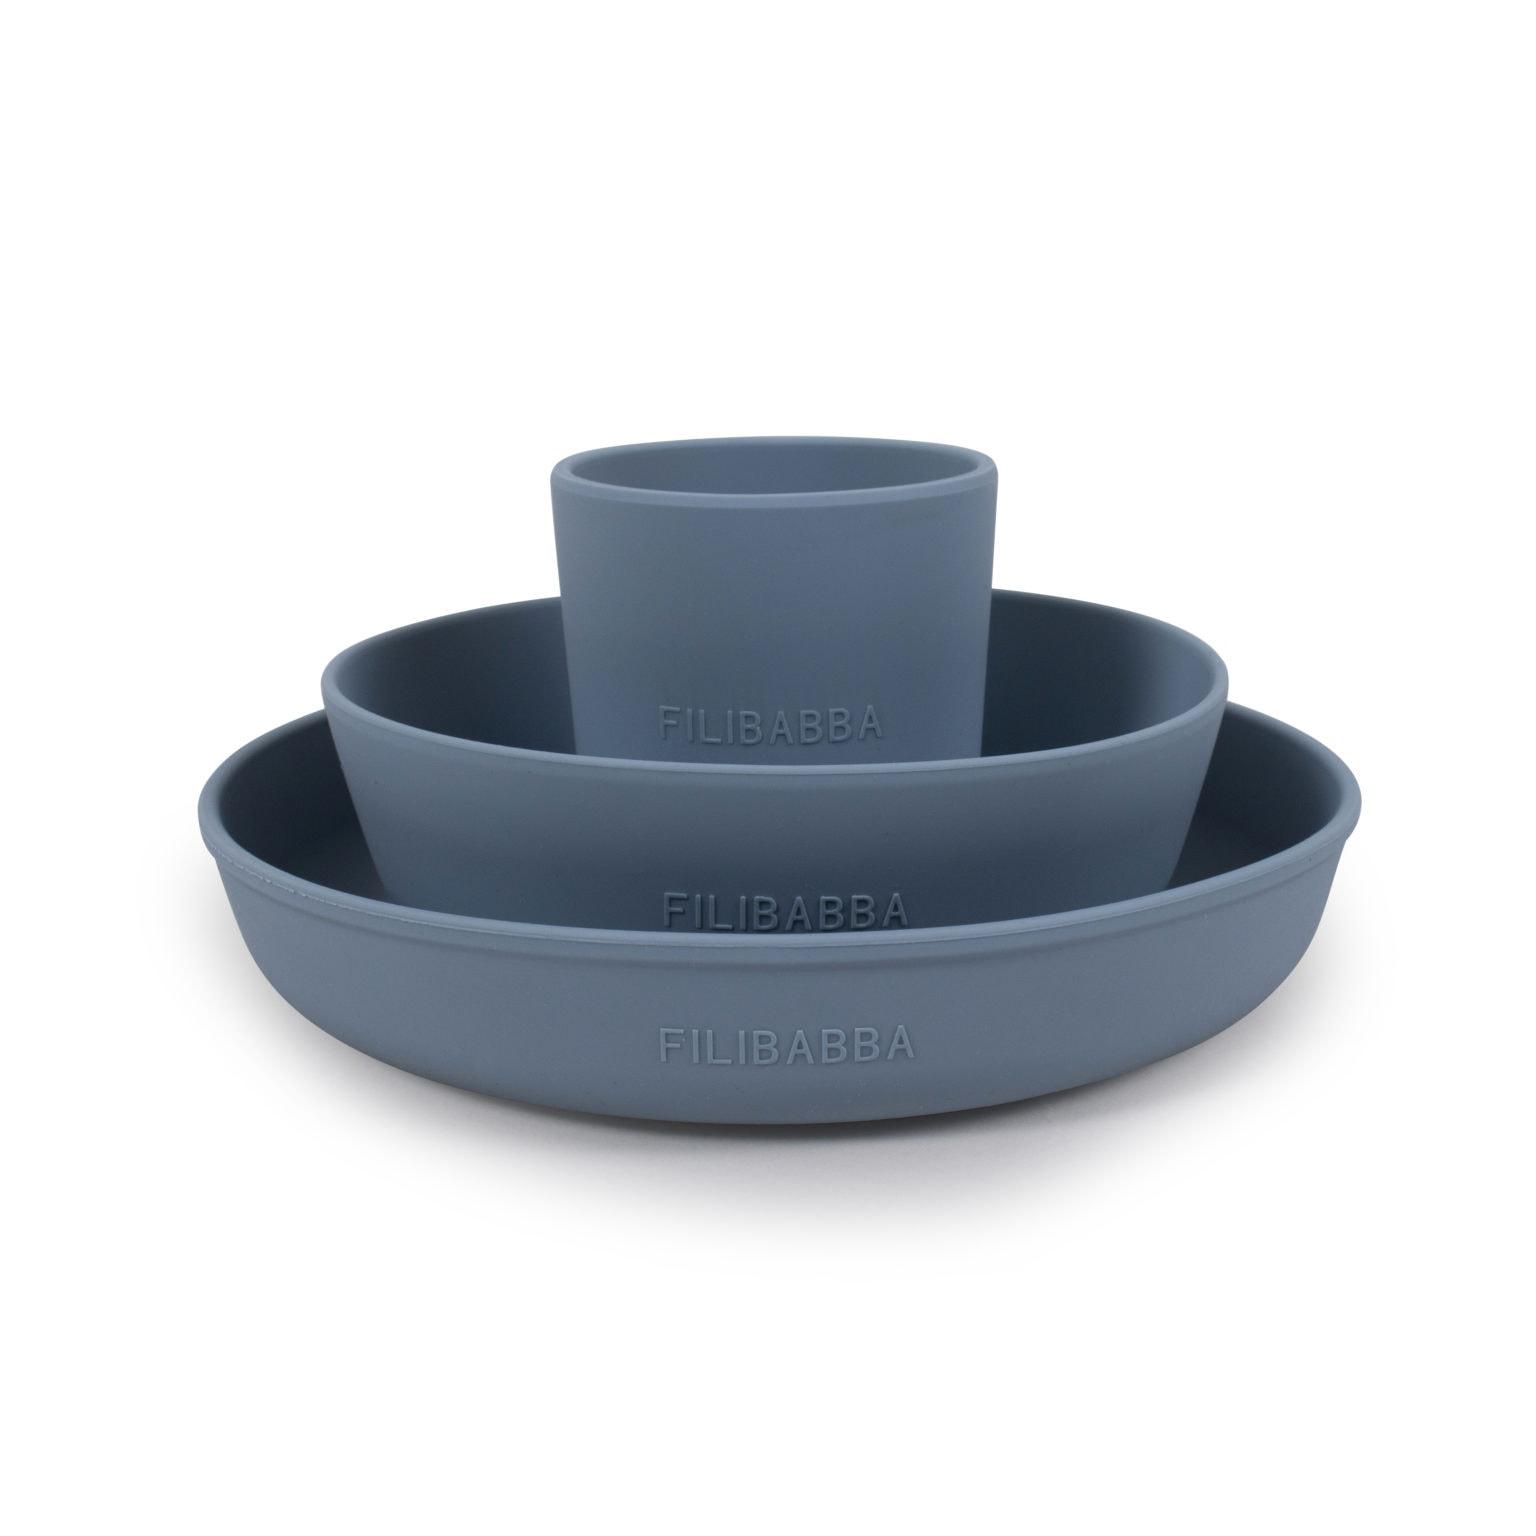 Filibabba - Silicone Dinner set, Powder blue (SI015)